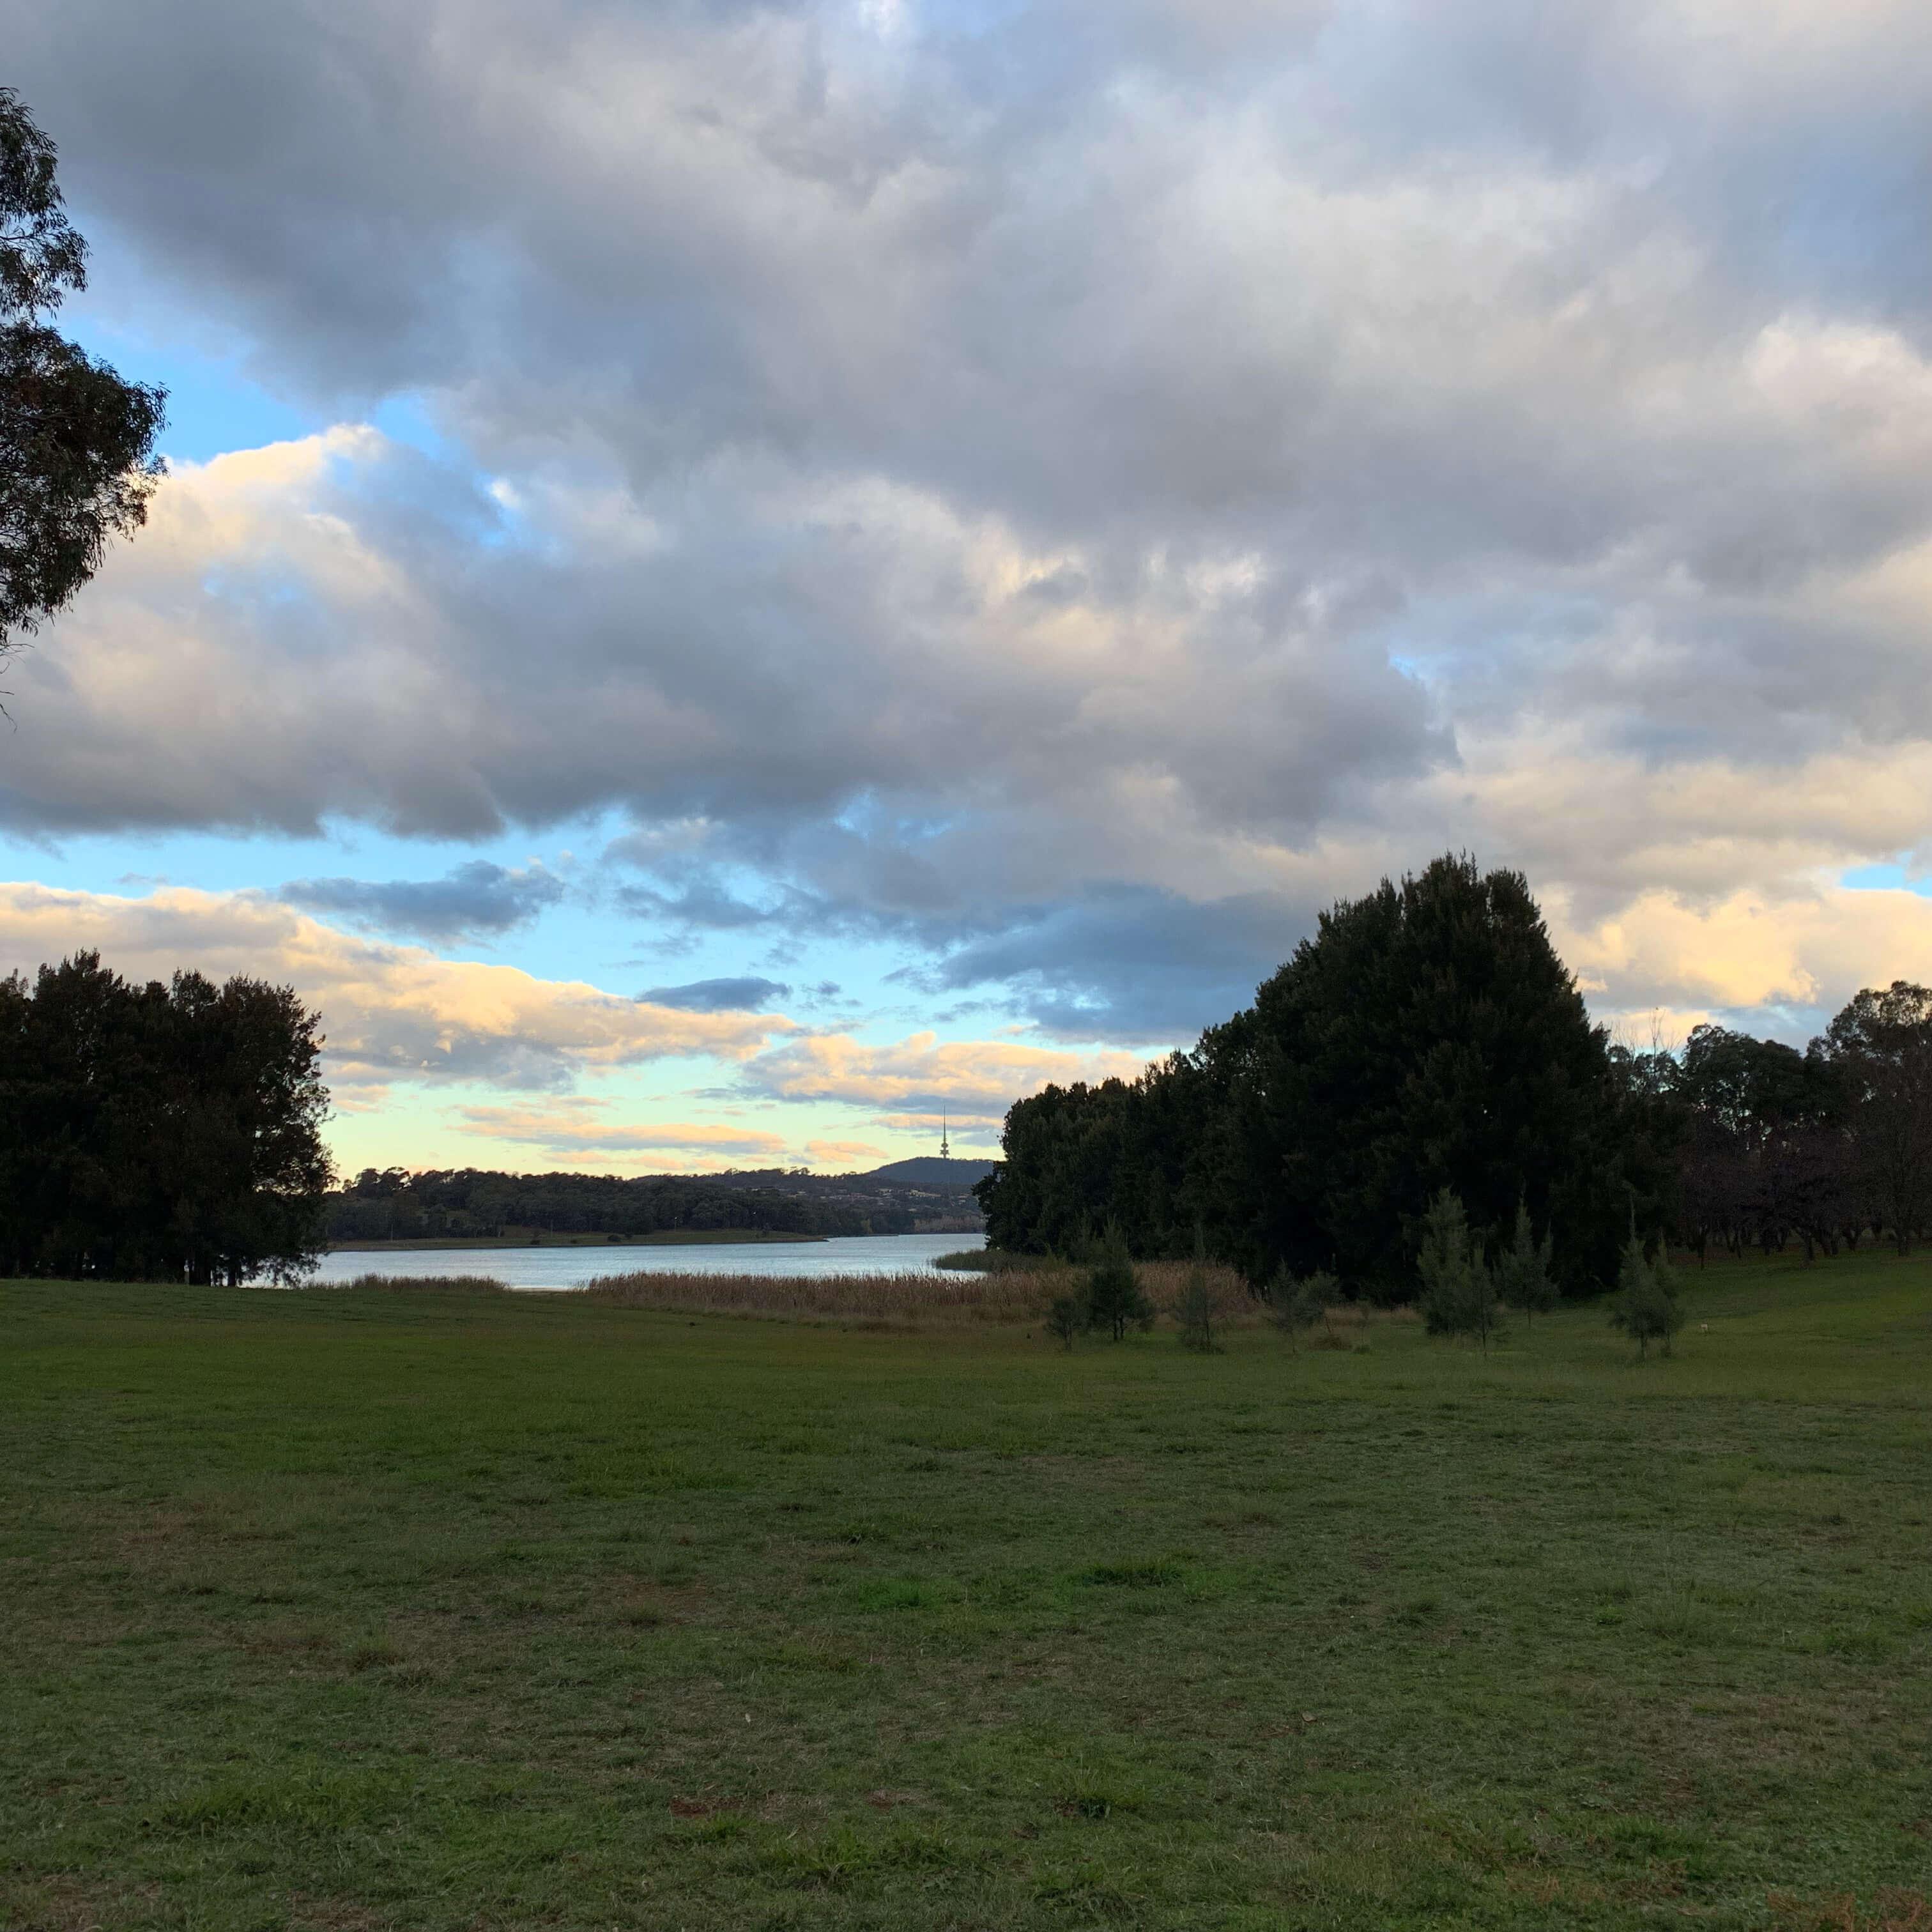 Walking along Lake Ginninderra in Canberra, Australia